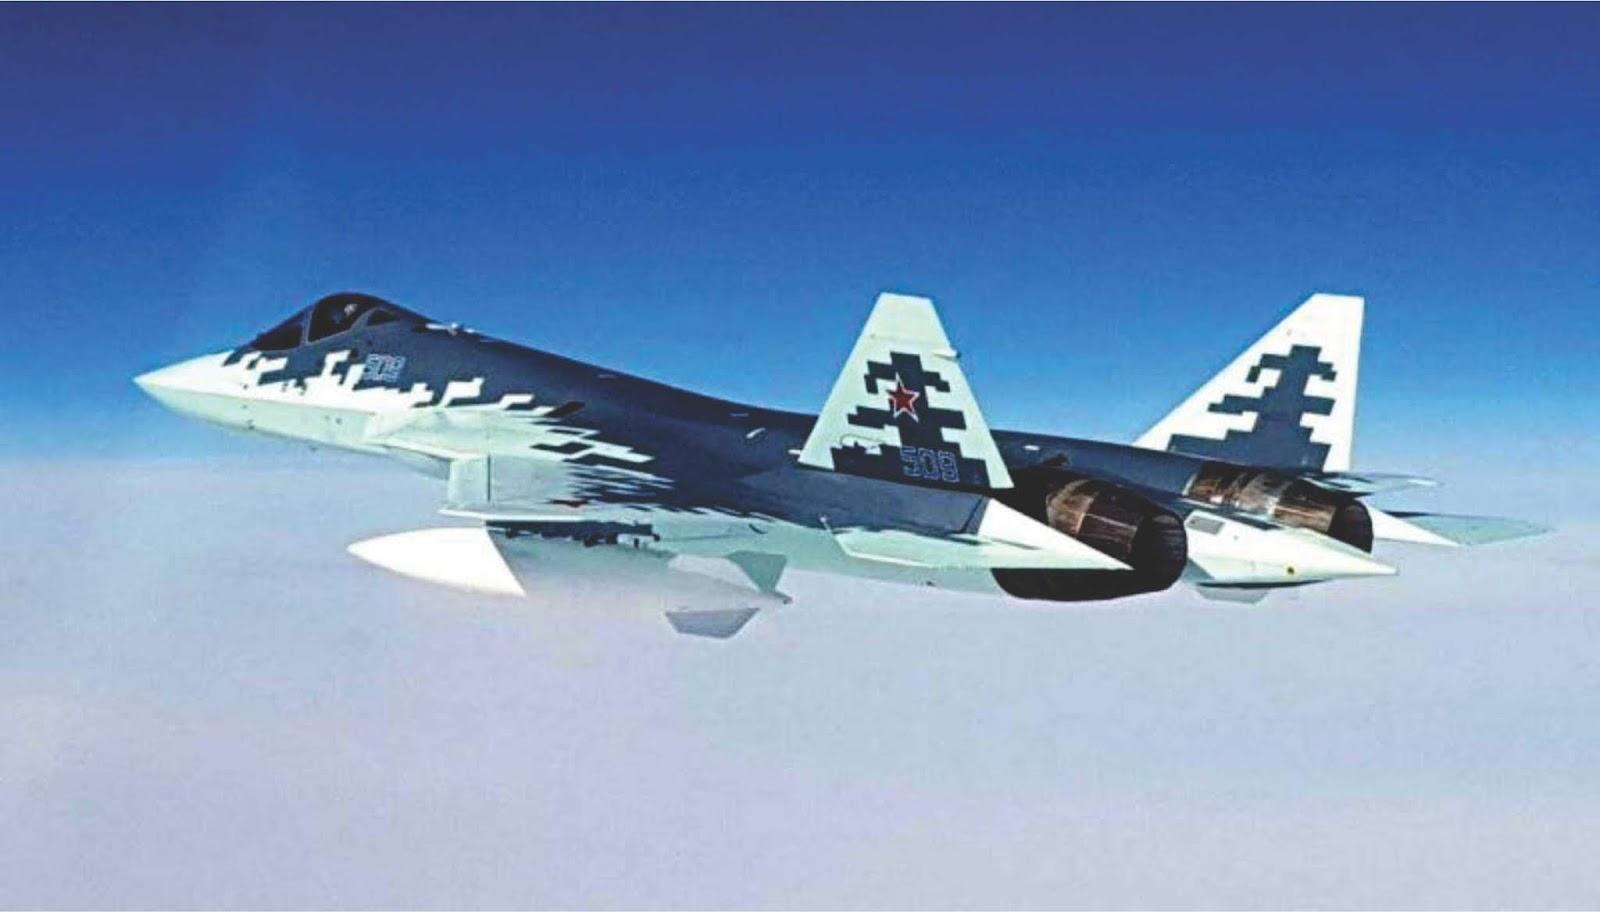 Rusia sedang menyiapkan pangkalan untuk Su-57